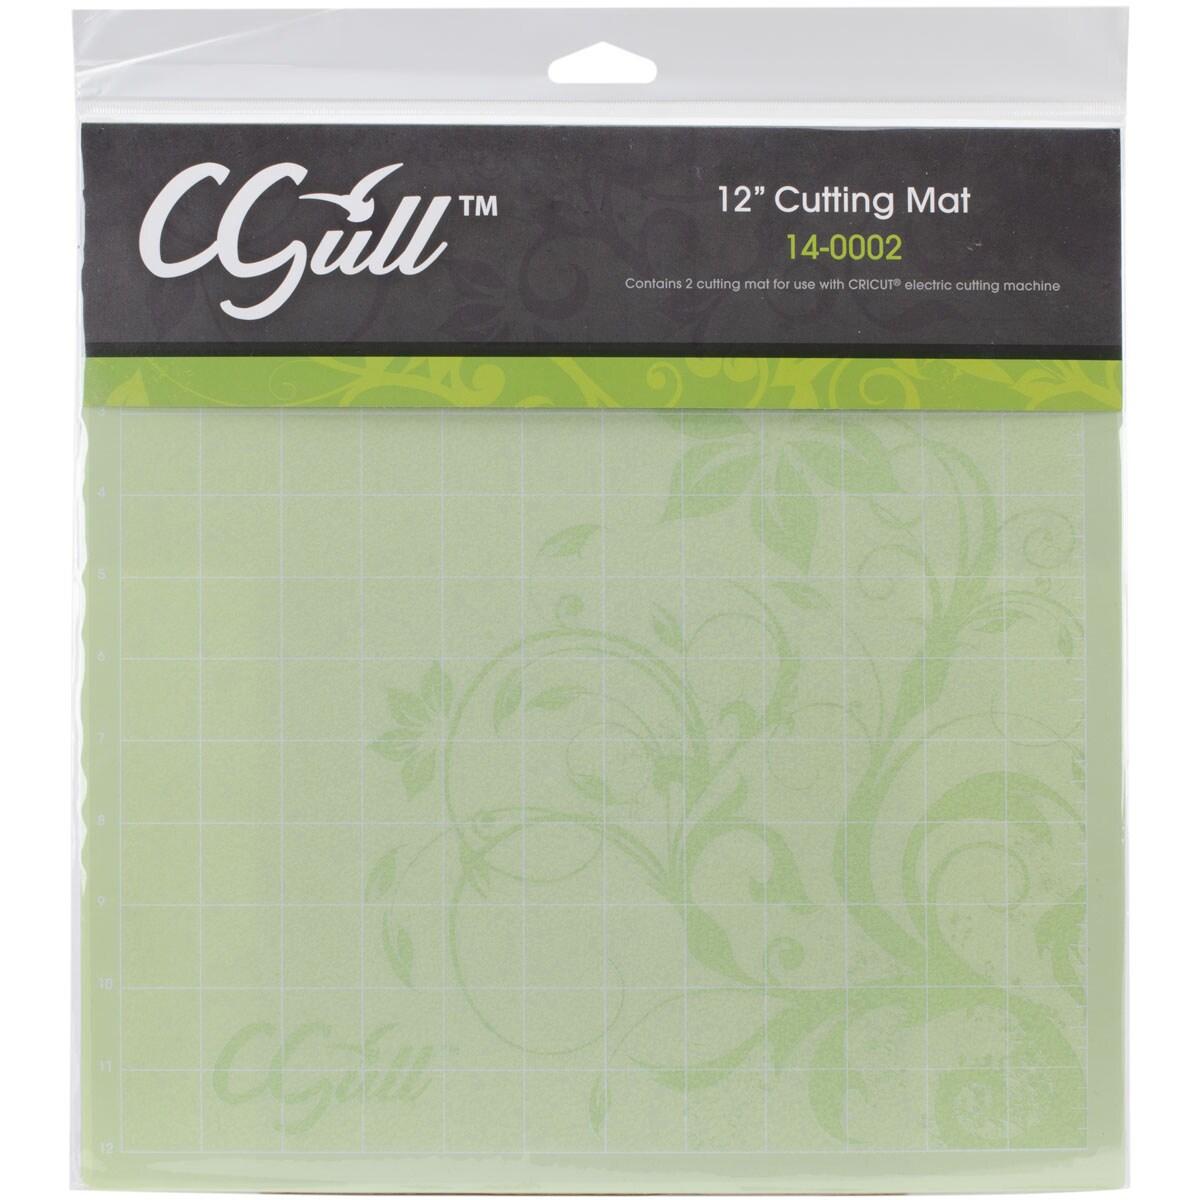 Cricut Cgull Cutting Cutting Mat (12x12) (CGull Cutting M...